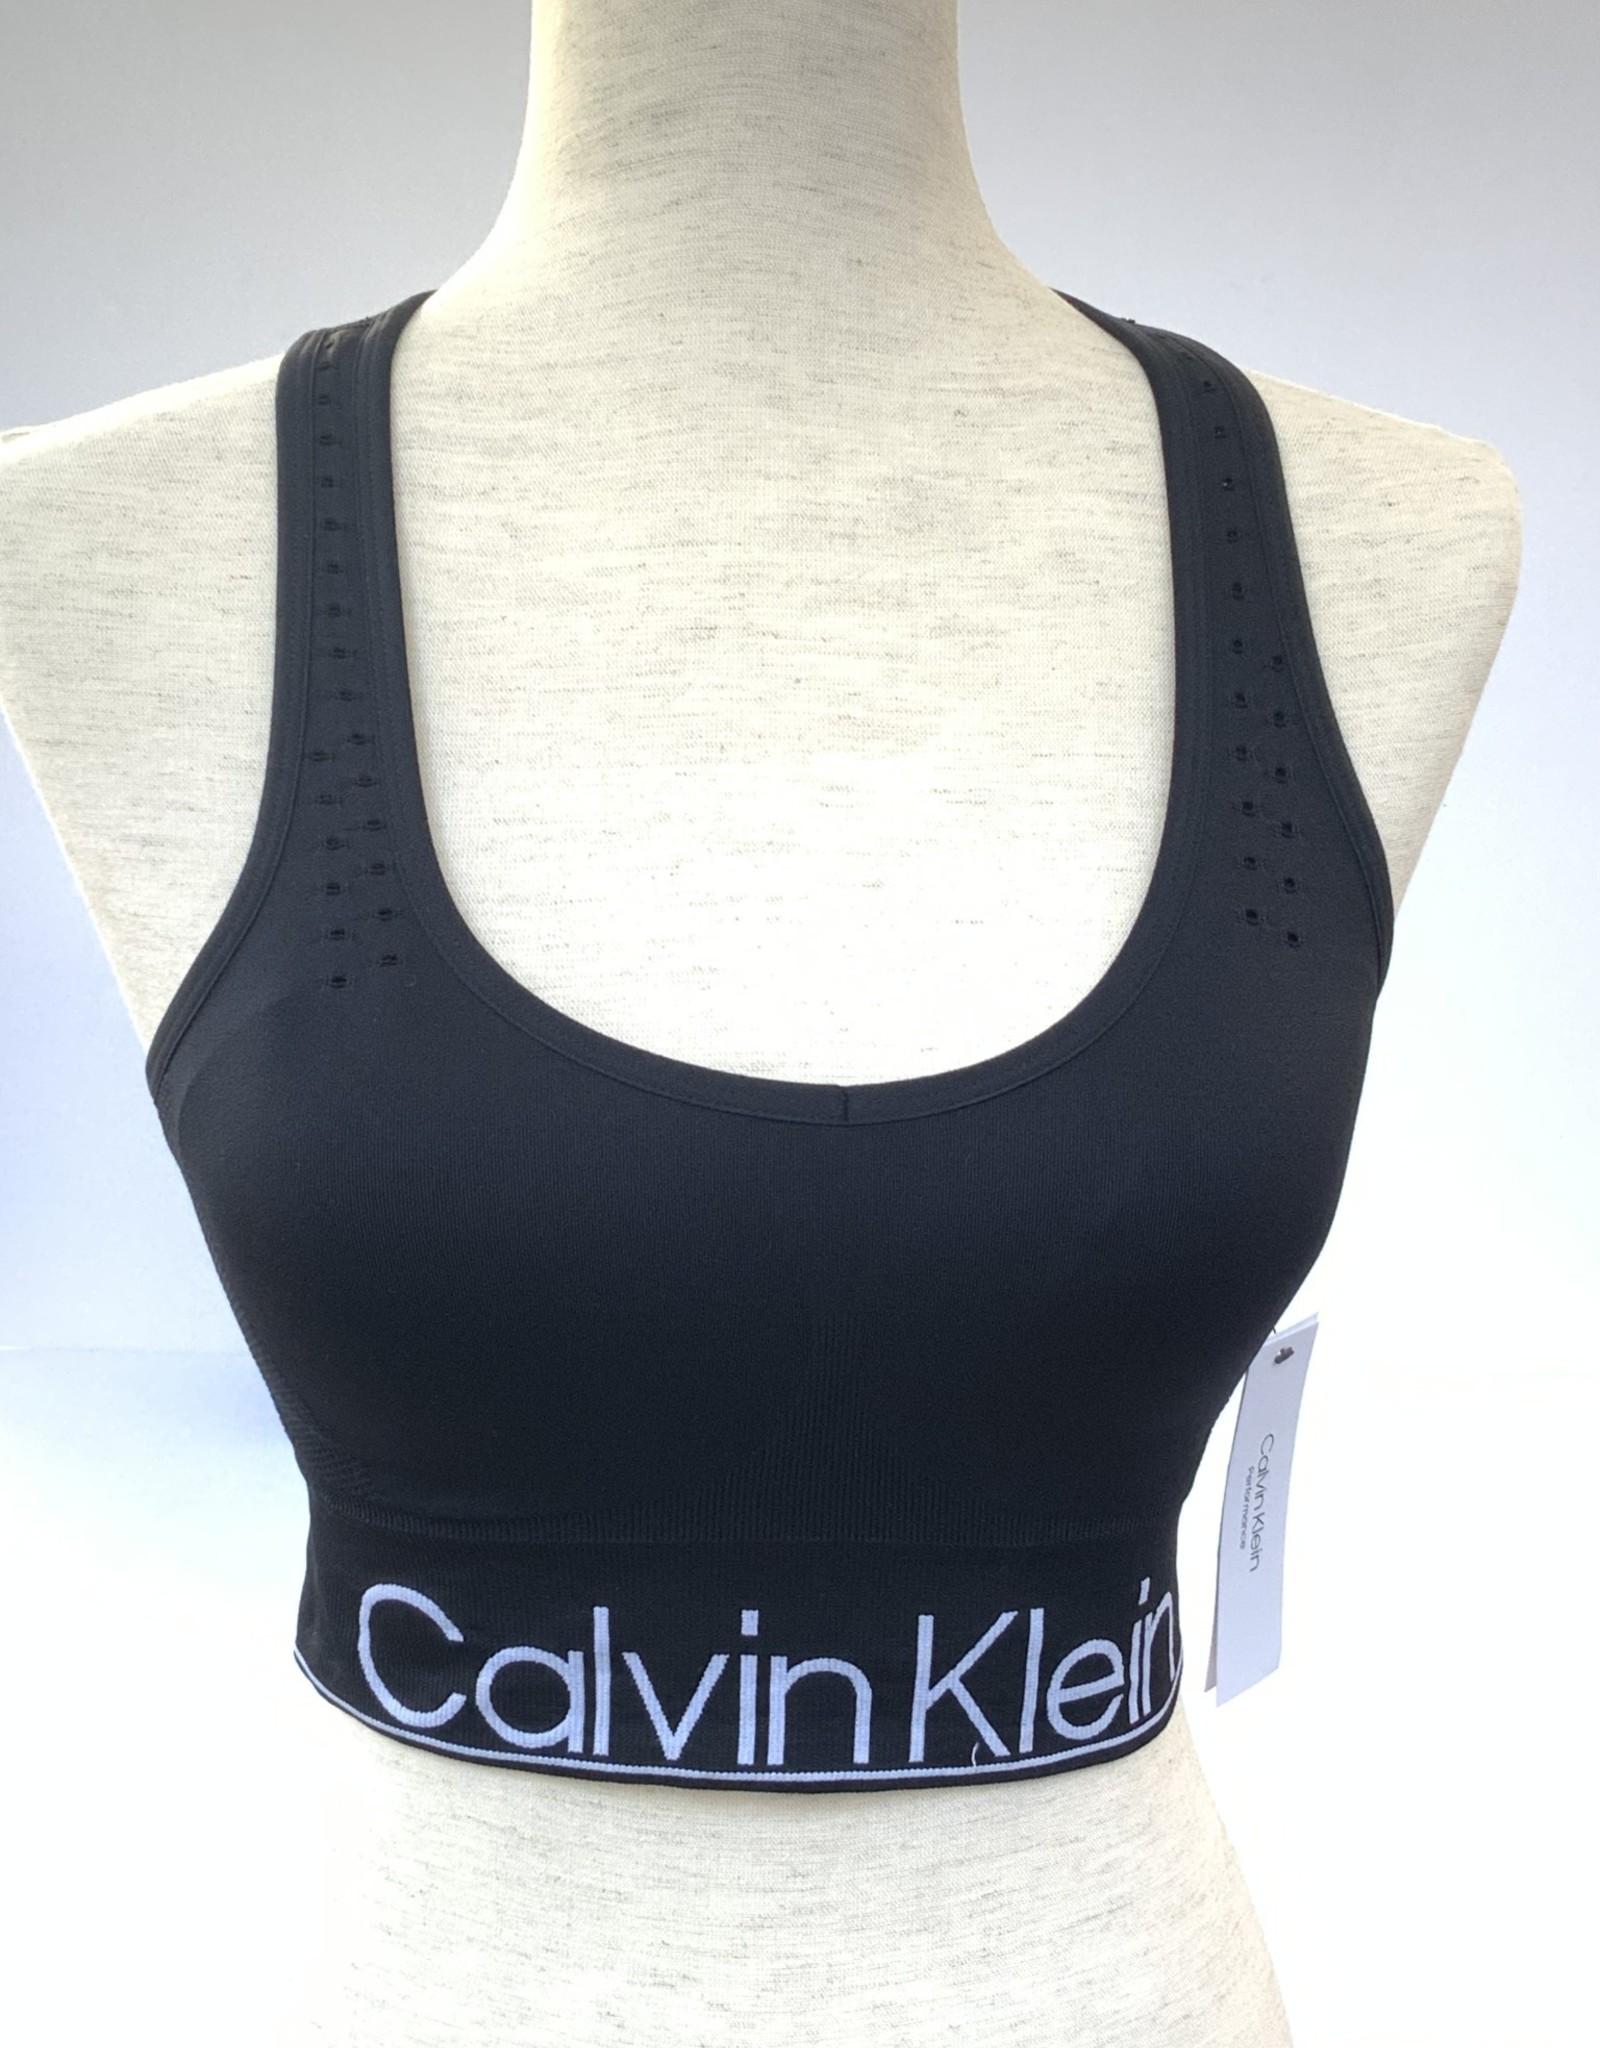 Calvin Klein Calvin Klein Performance  Mid-Impact Racerback Sports Bra